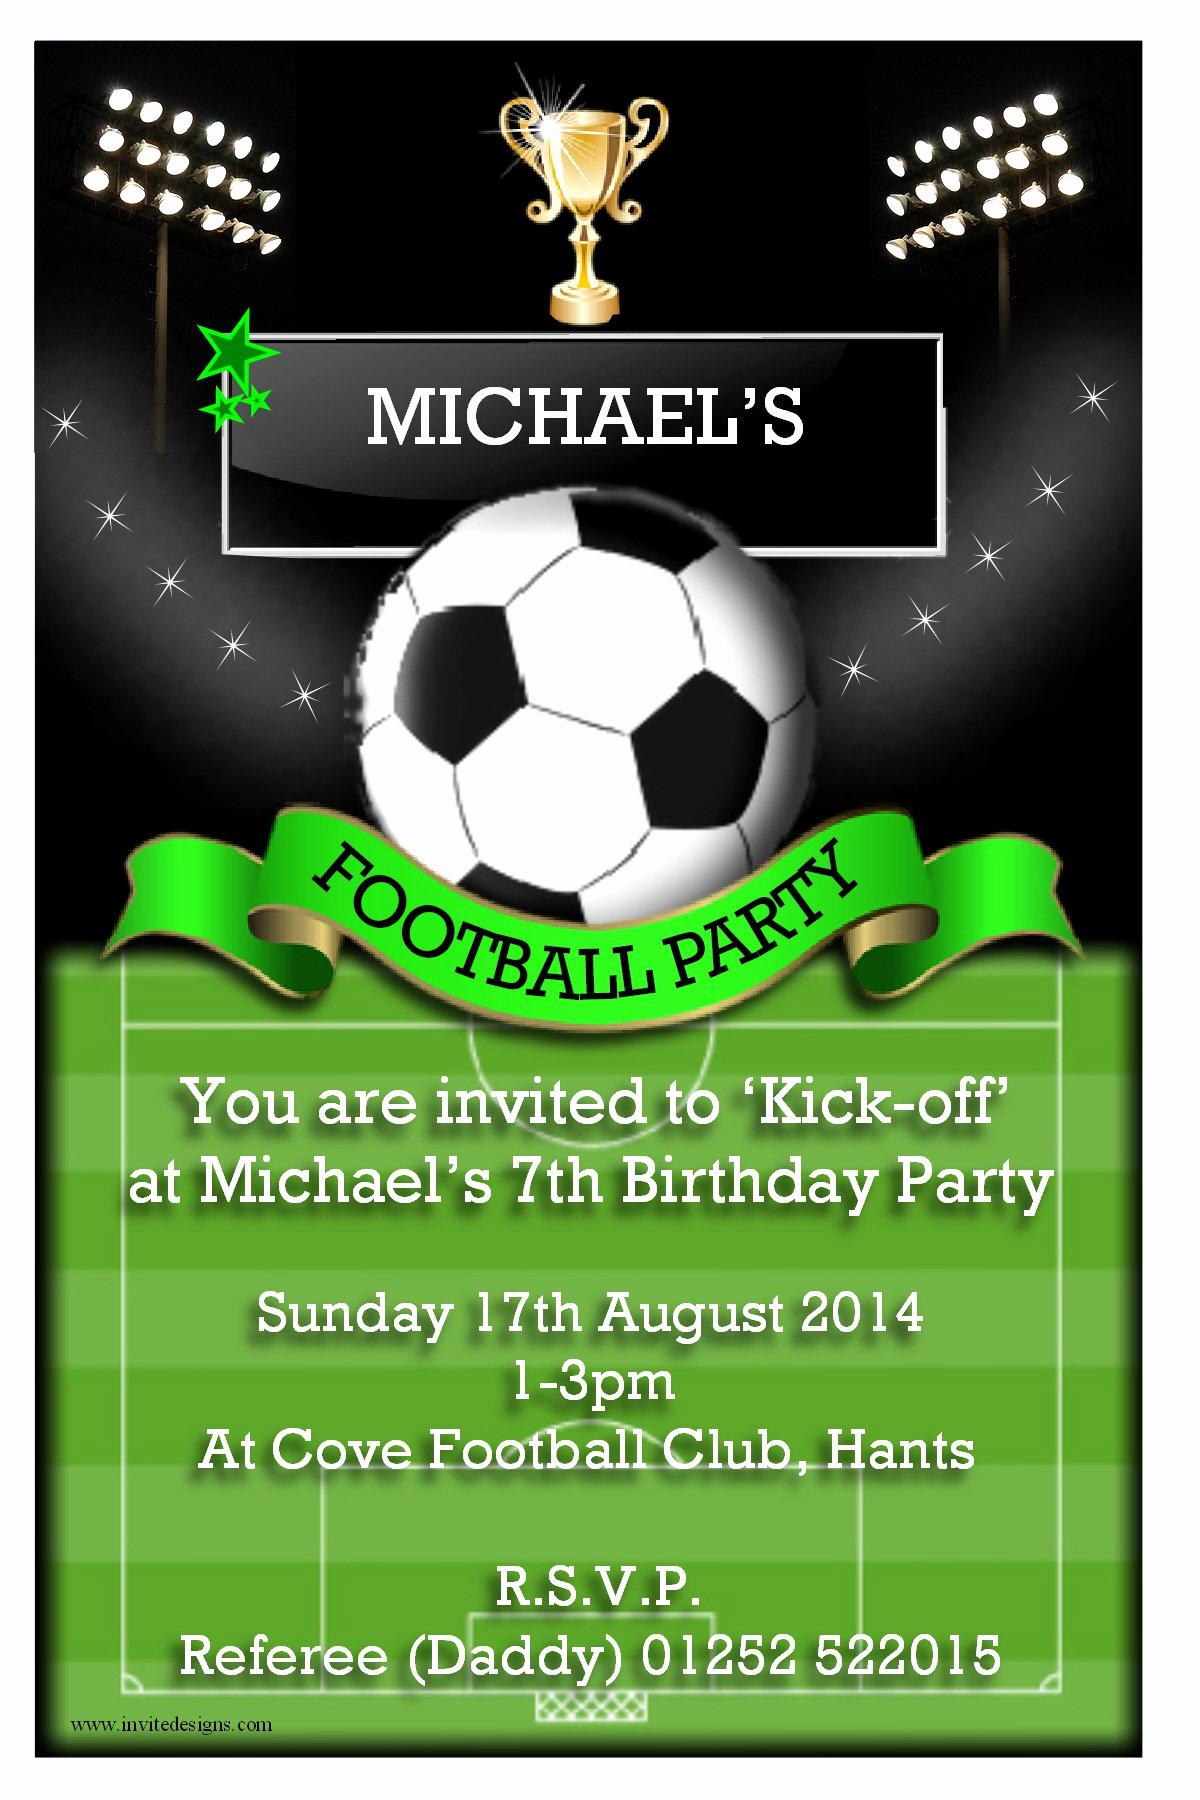 Football Ticket Invitation Template Free Inspirational Football Party Invitations